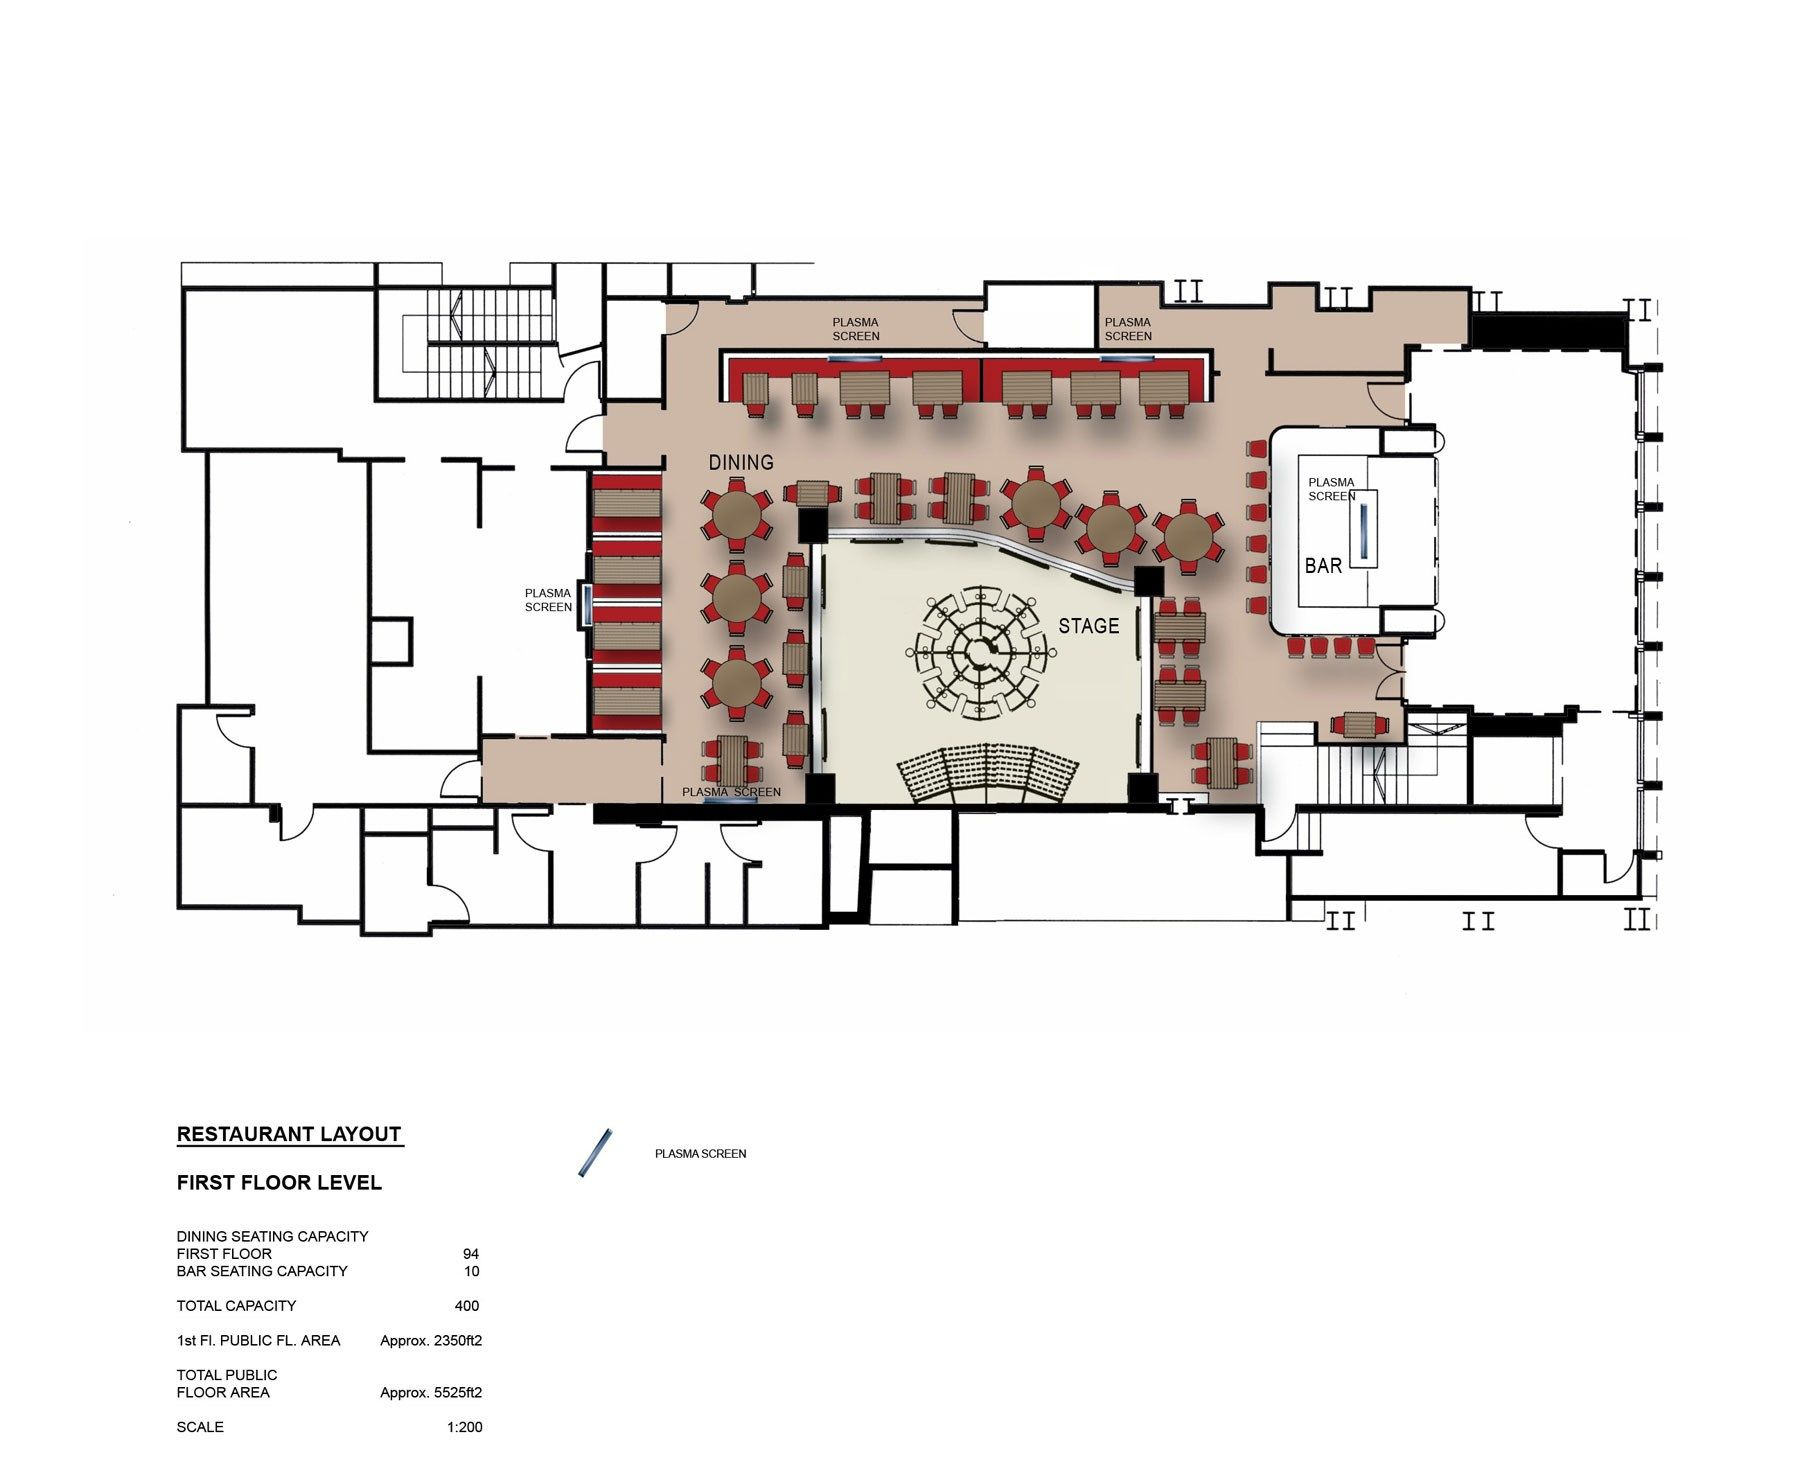 design of cafe starbucks - Поиск в Google | A 157 | Pinterest ...